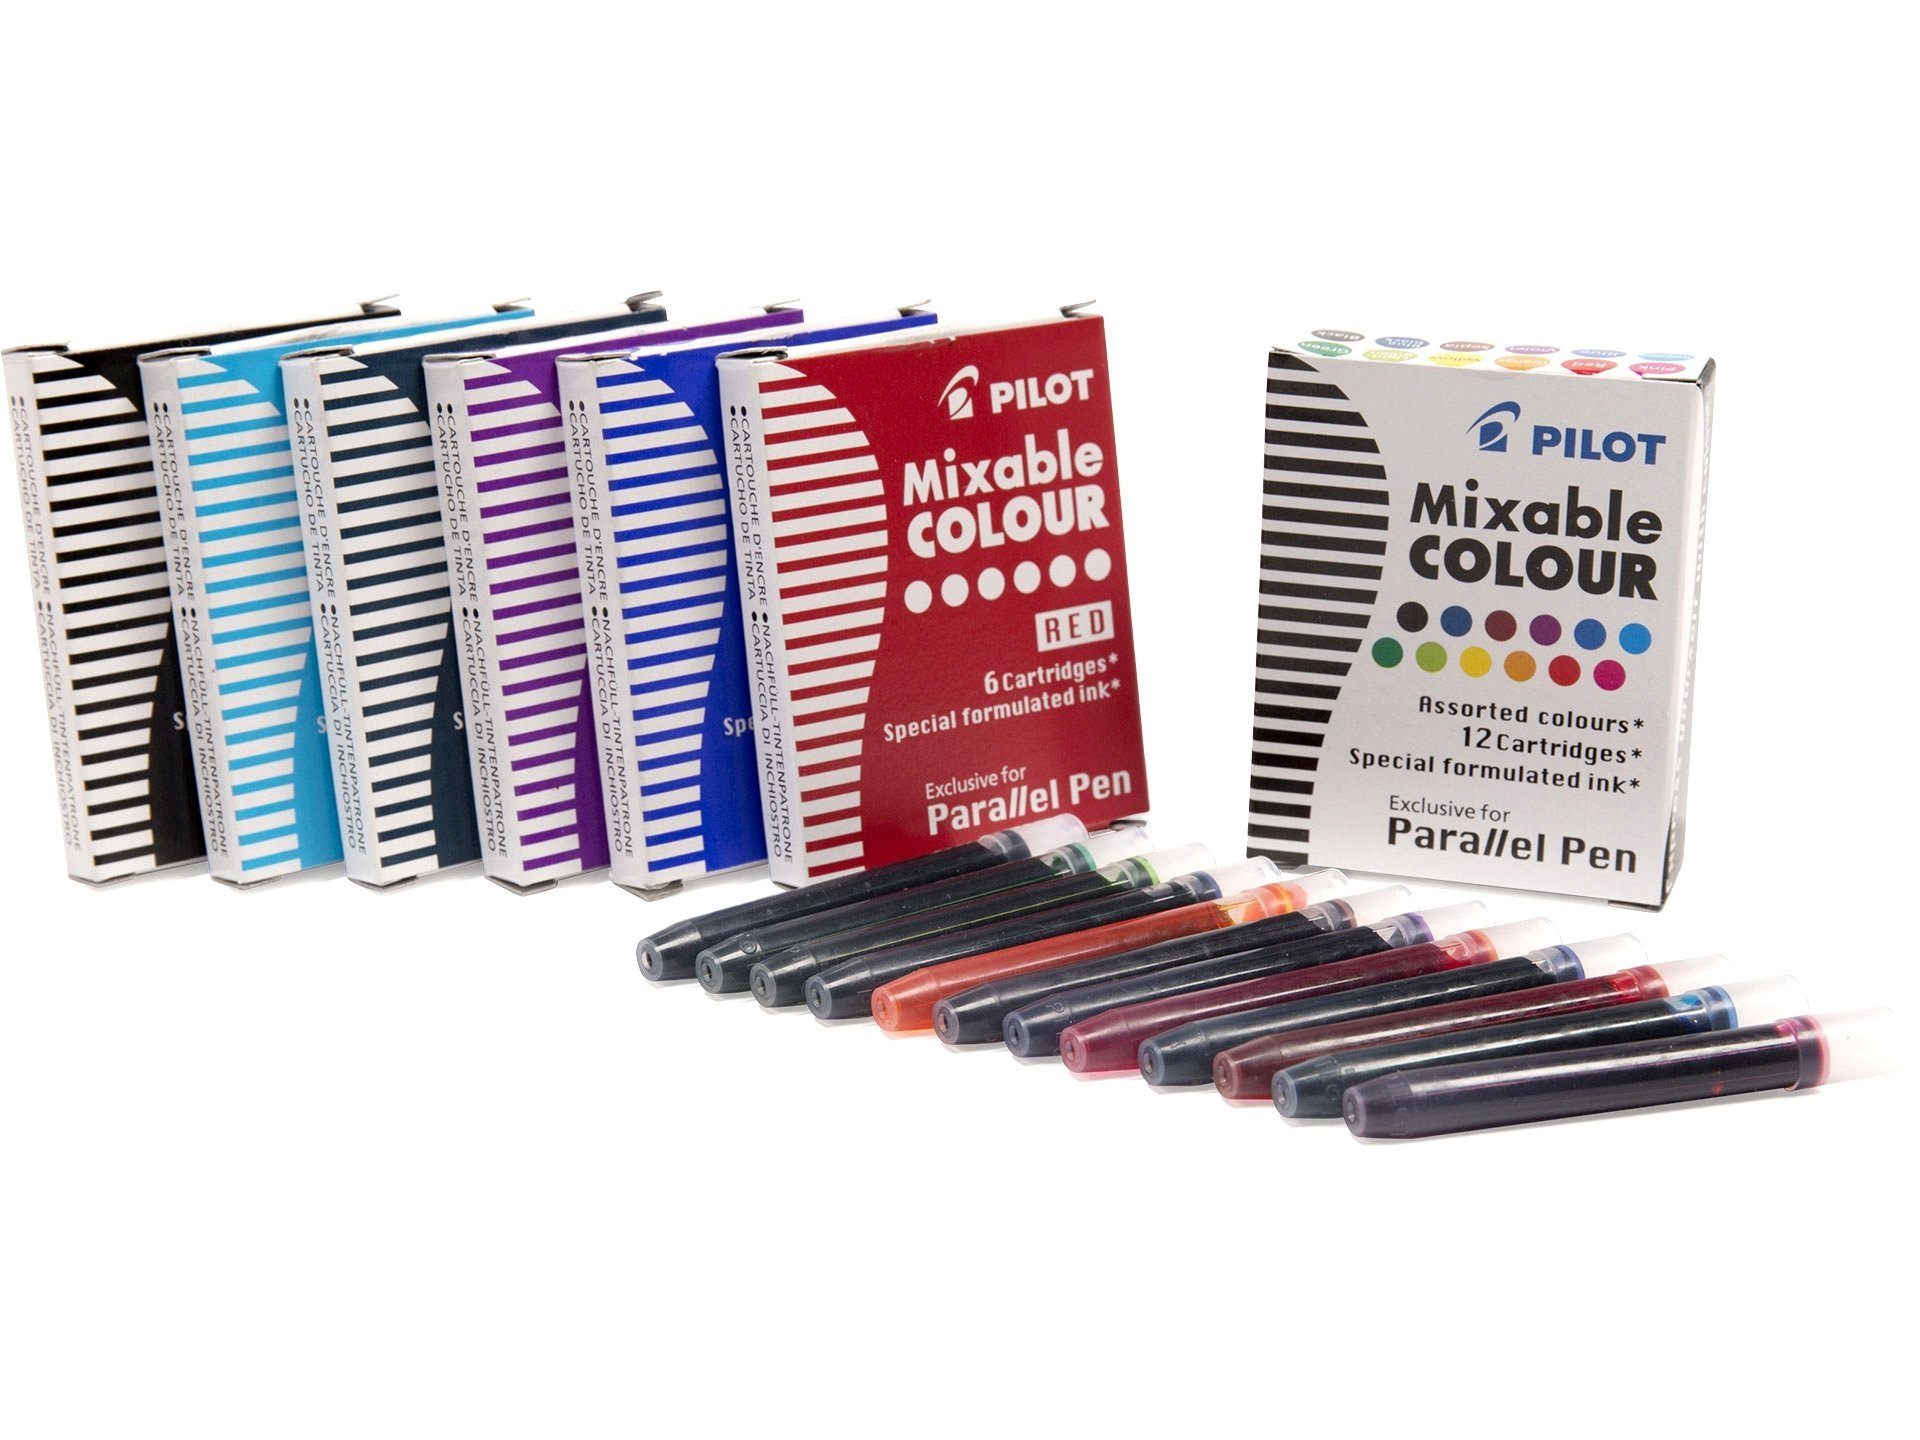 Pilot Mischbar Colour Patronen Pilot Parallel Pen Paket 12 Stk Cartridges